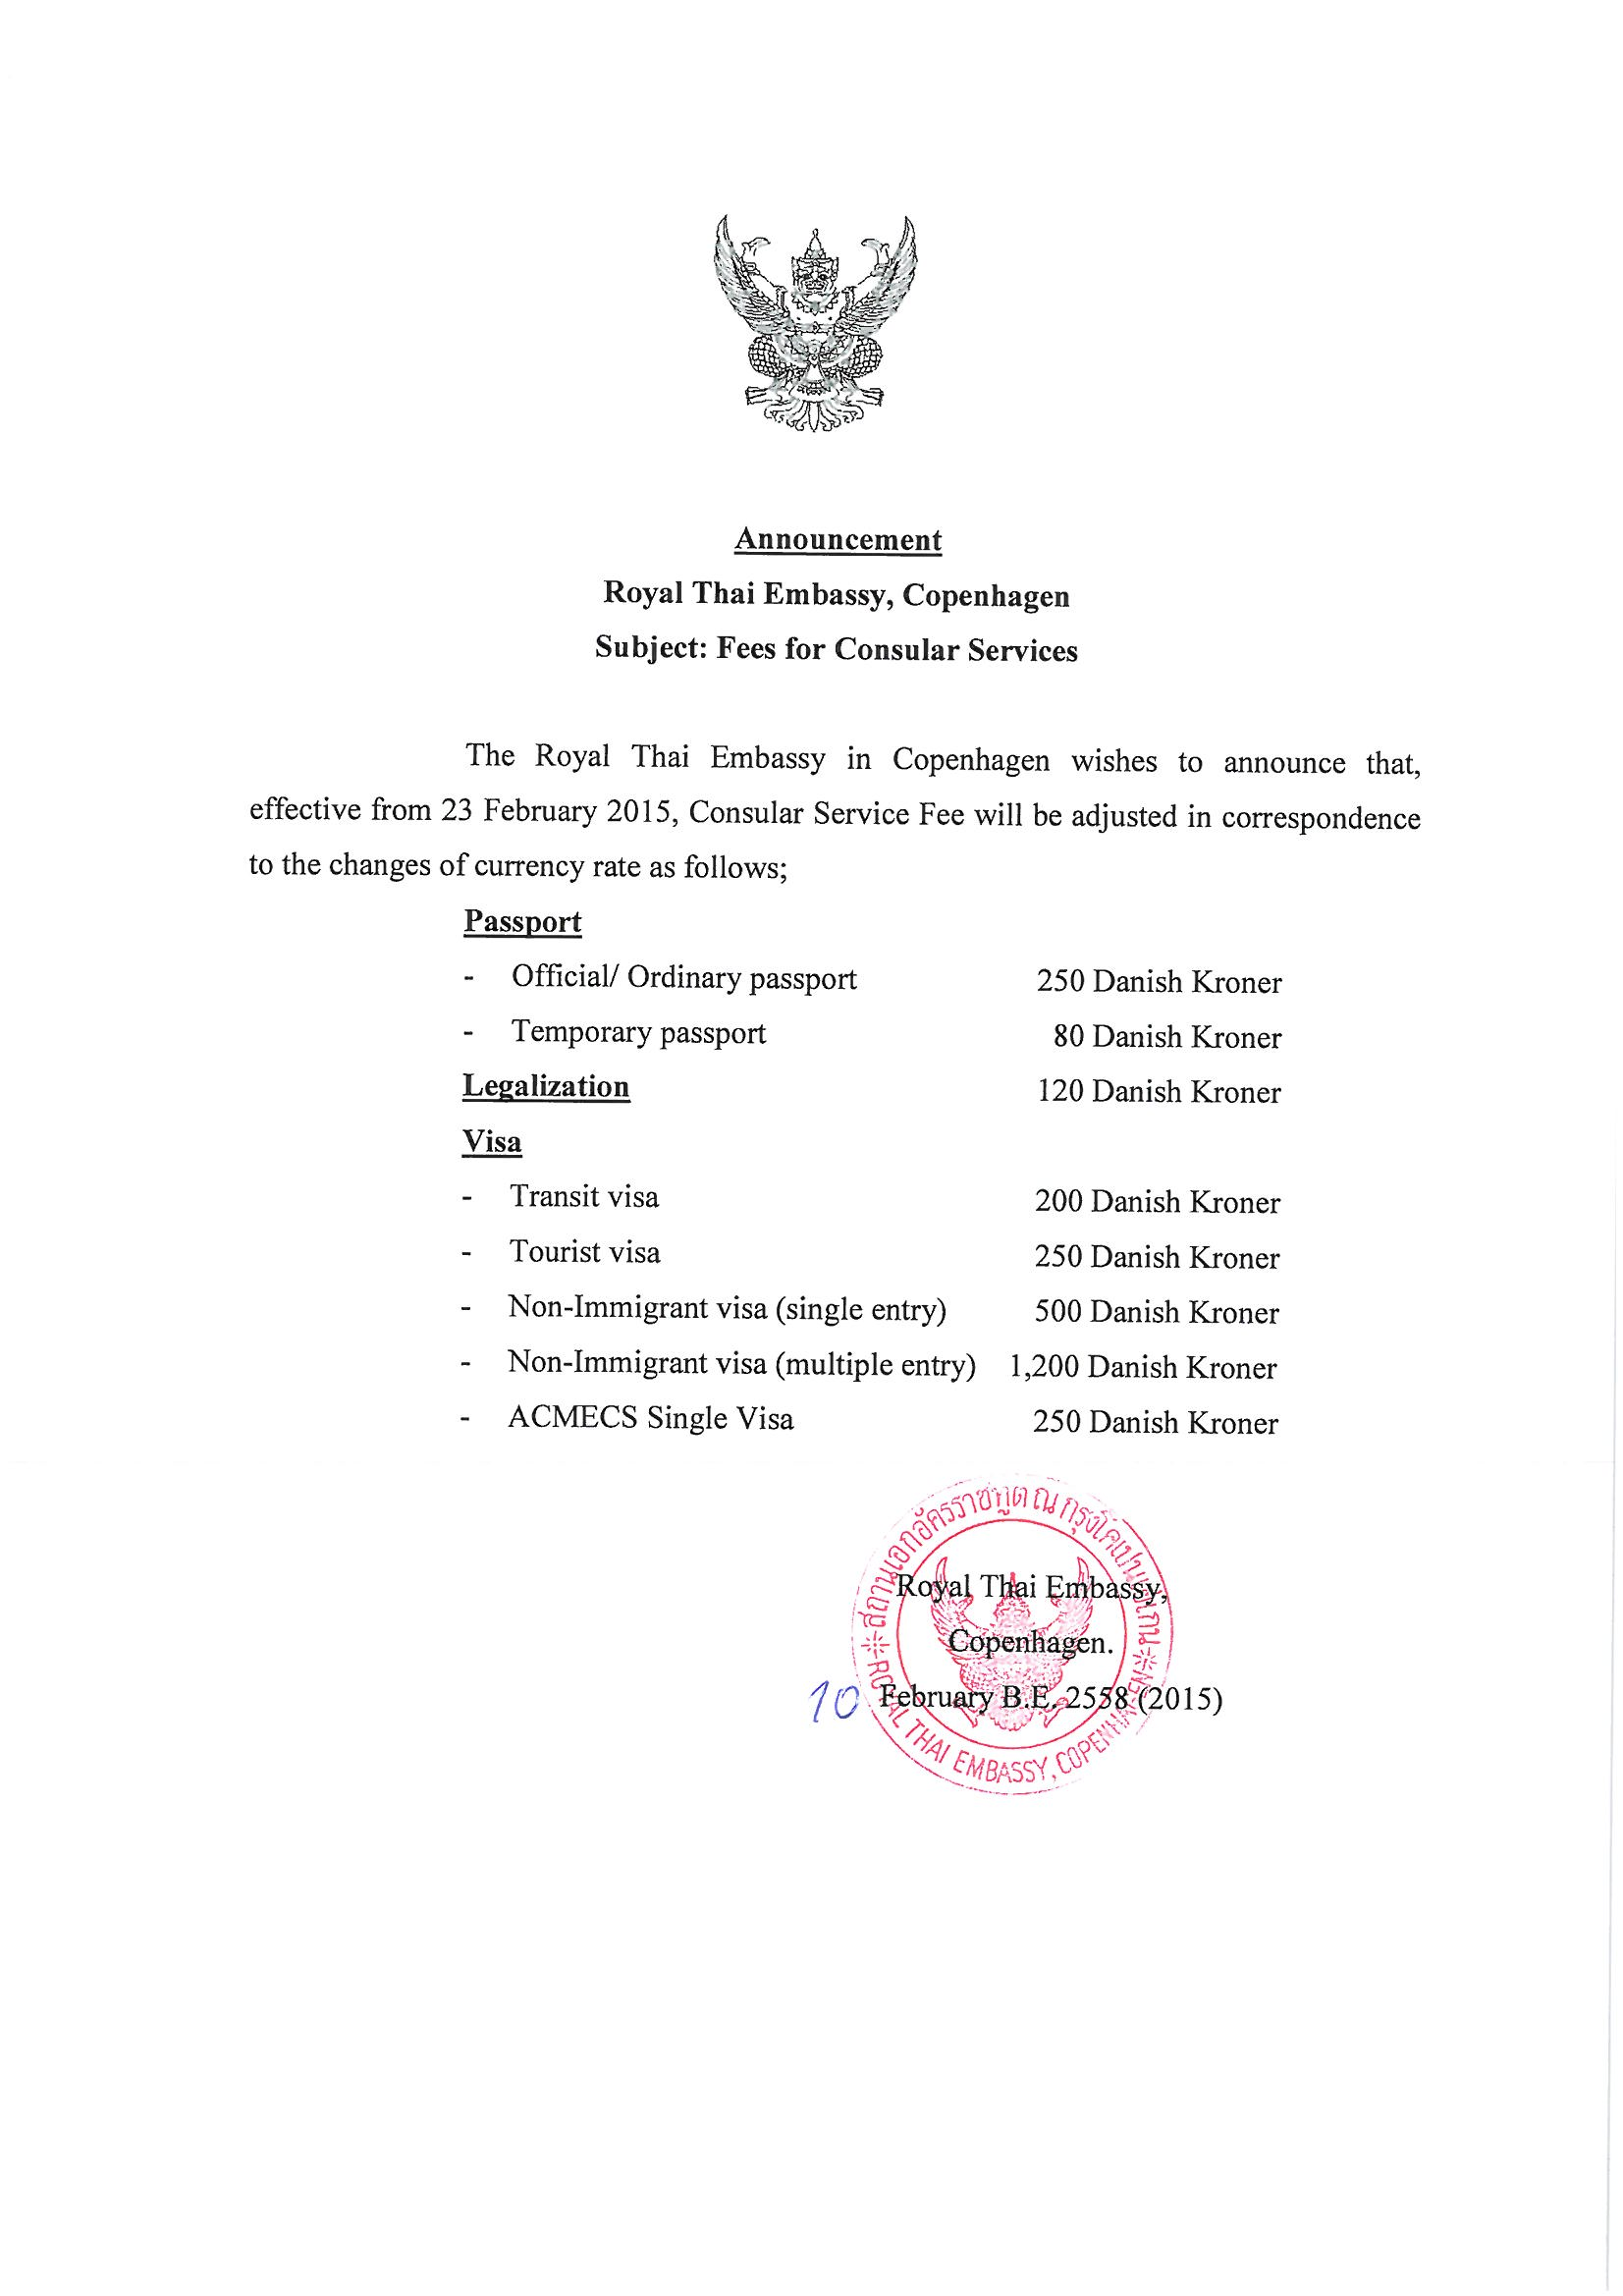 Fees for consular services for Consular services